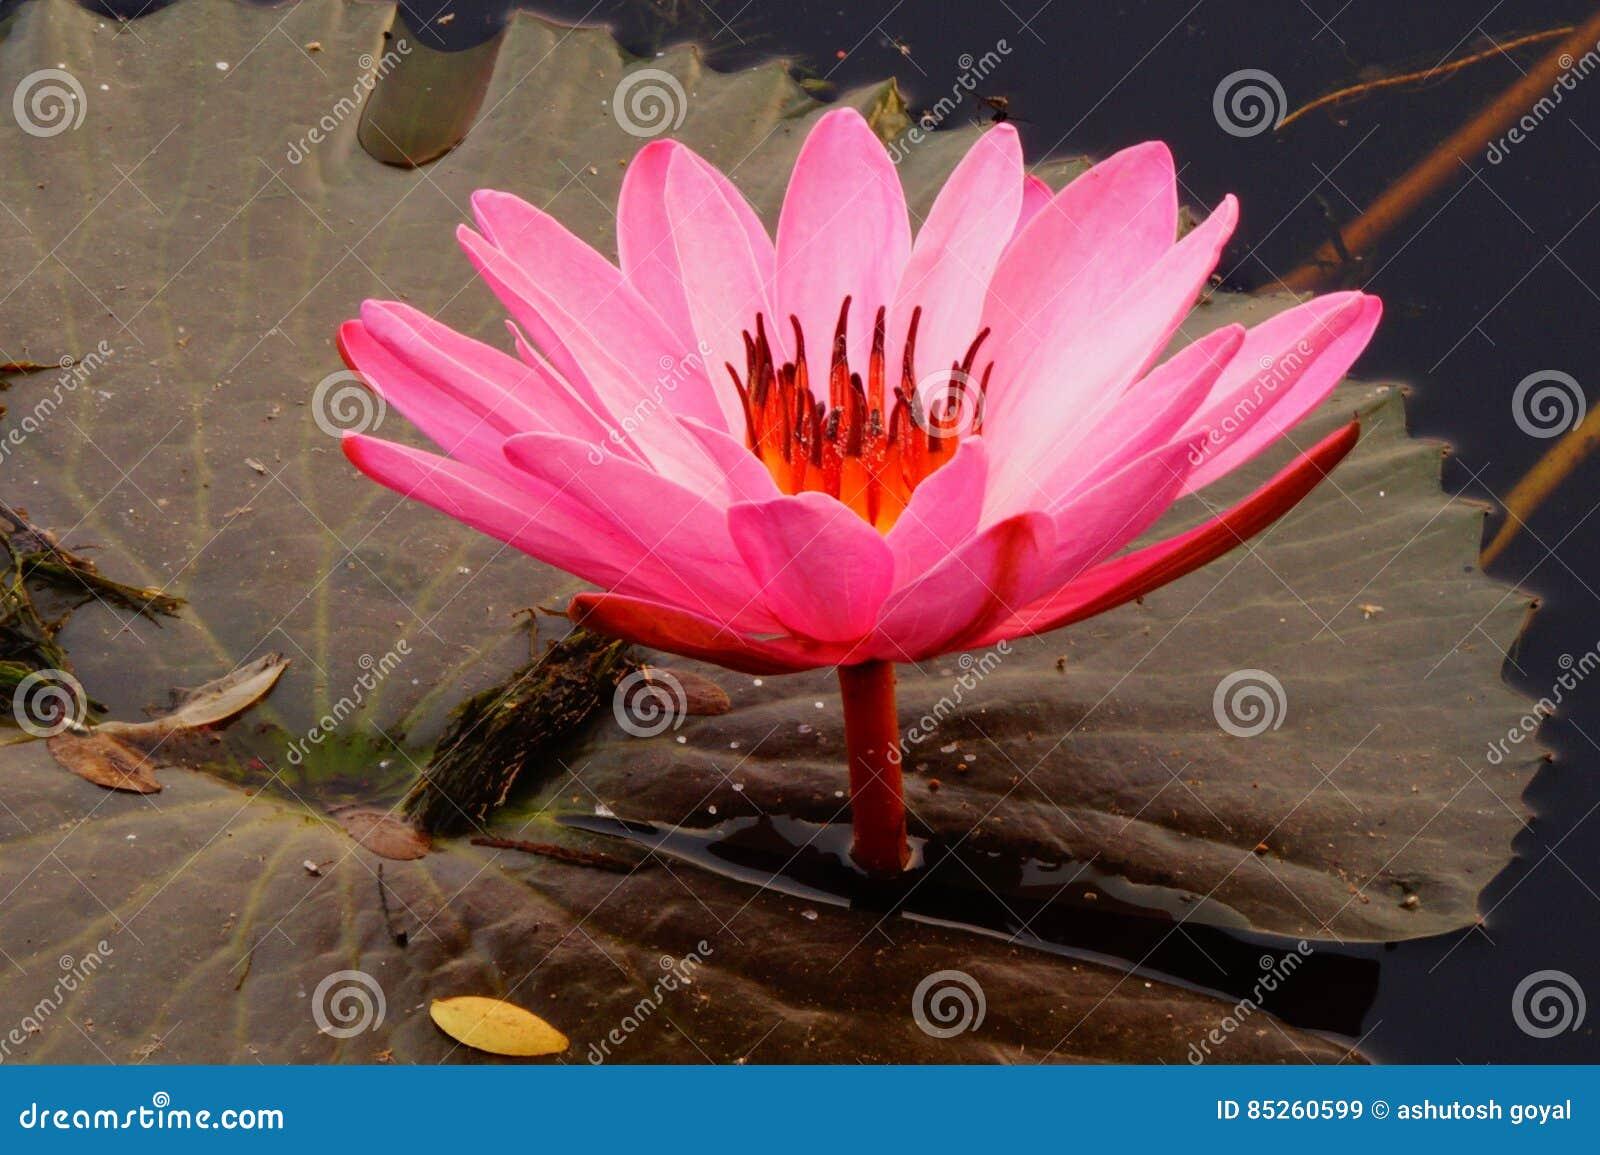 Lotus Flower Stock Image Image Of India Flower Symbol 85260599